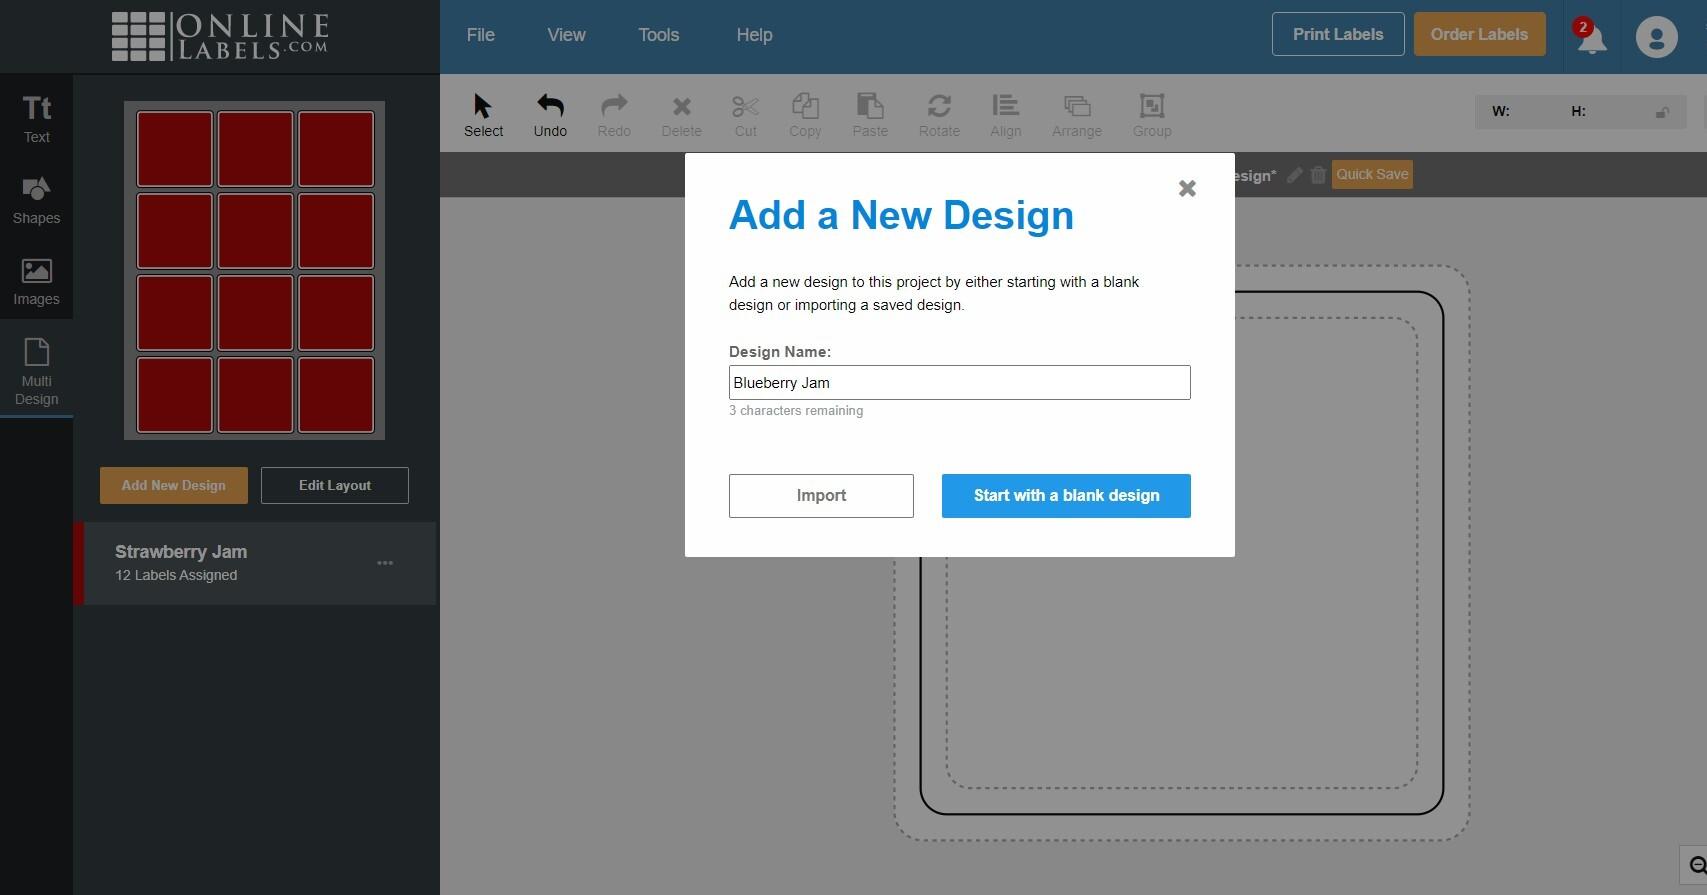 Add a new design using the multi design tool